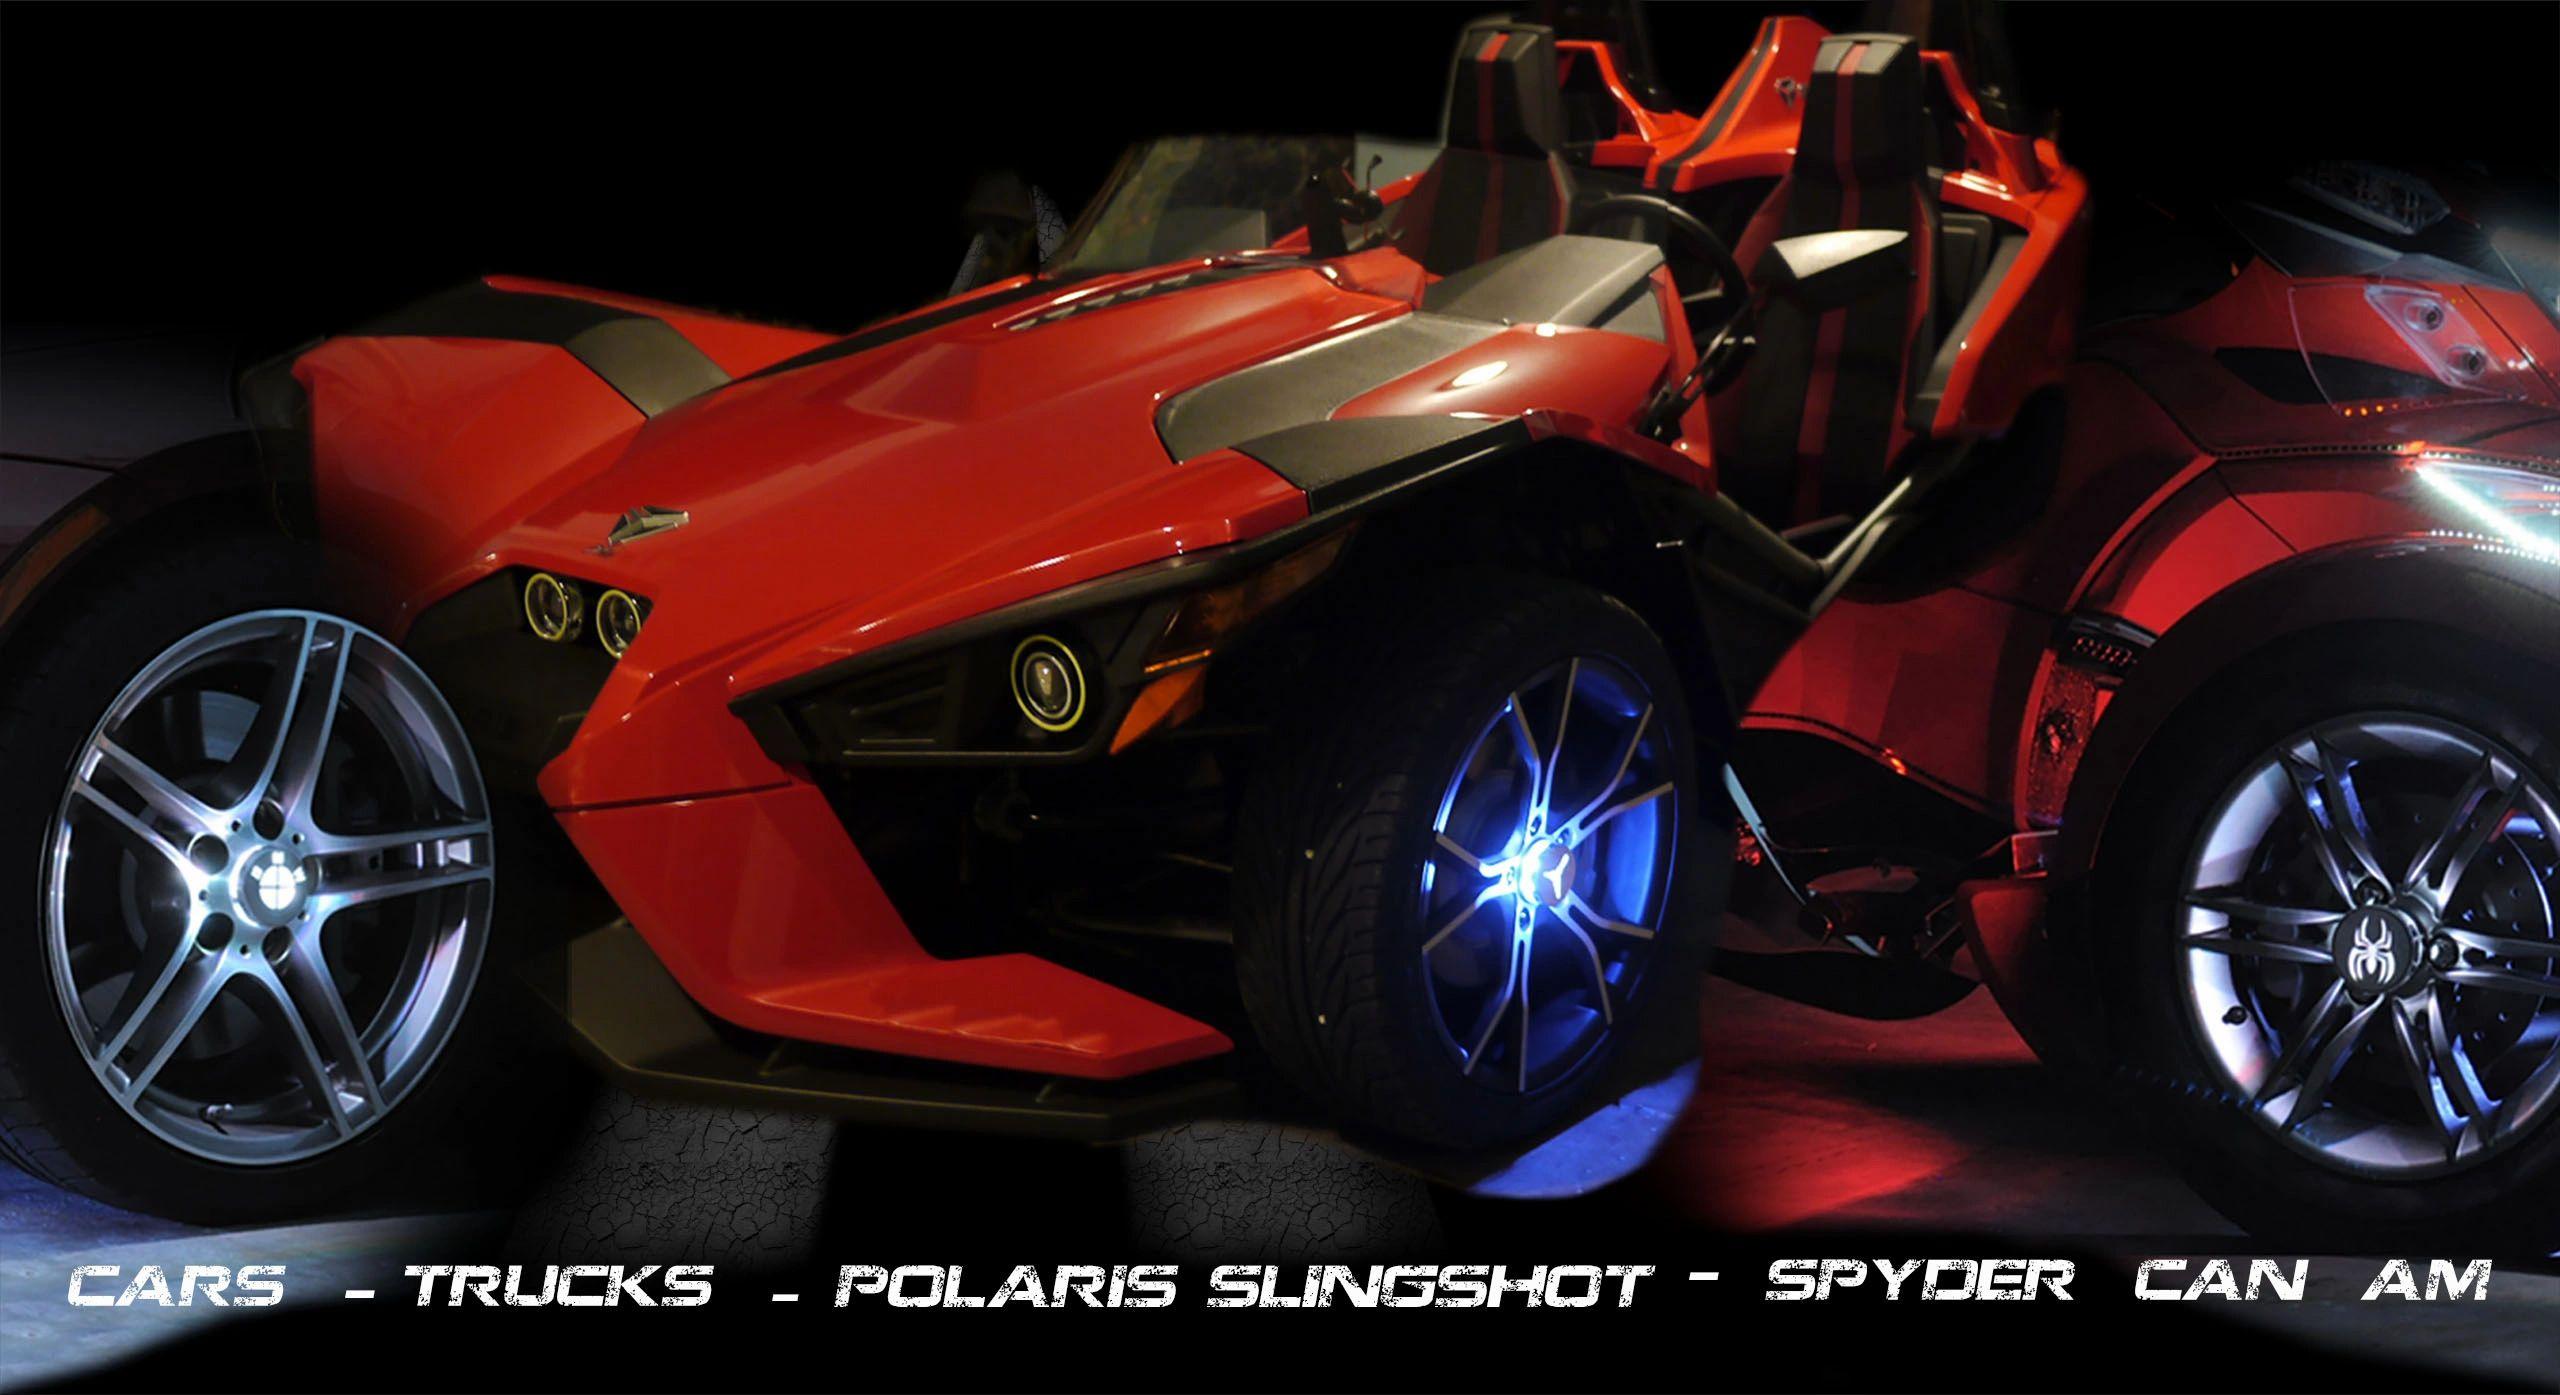 GloRyder Wheel Lights